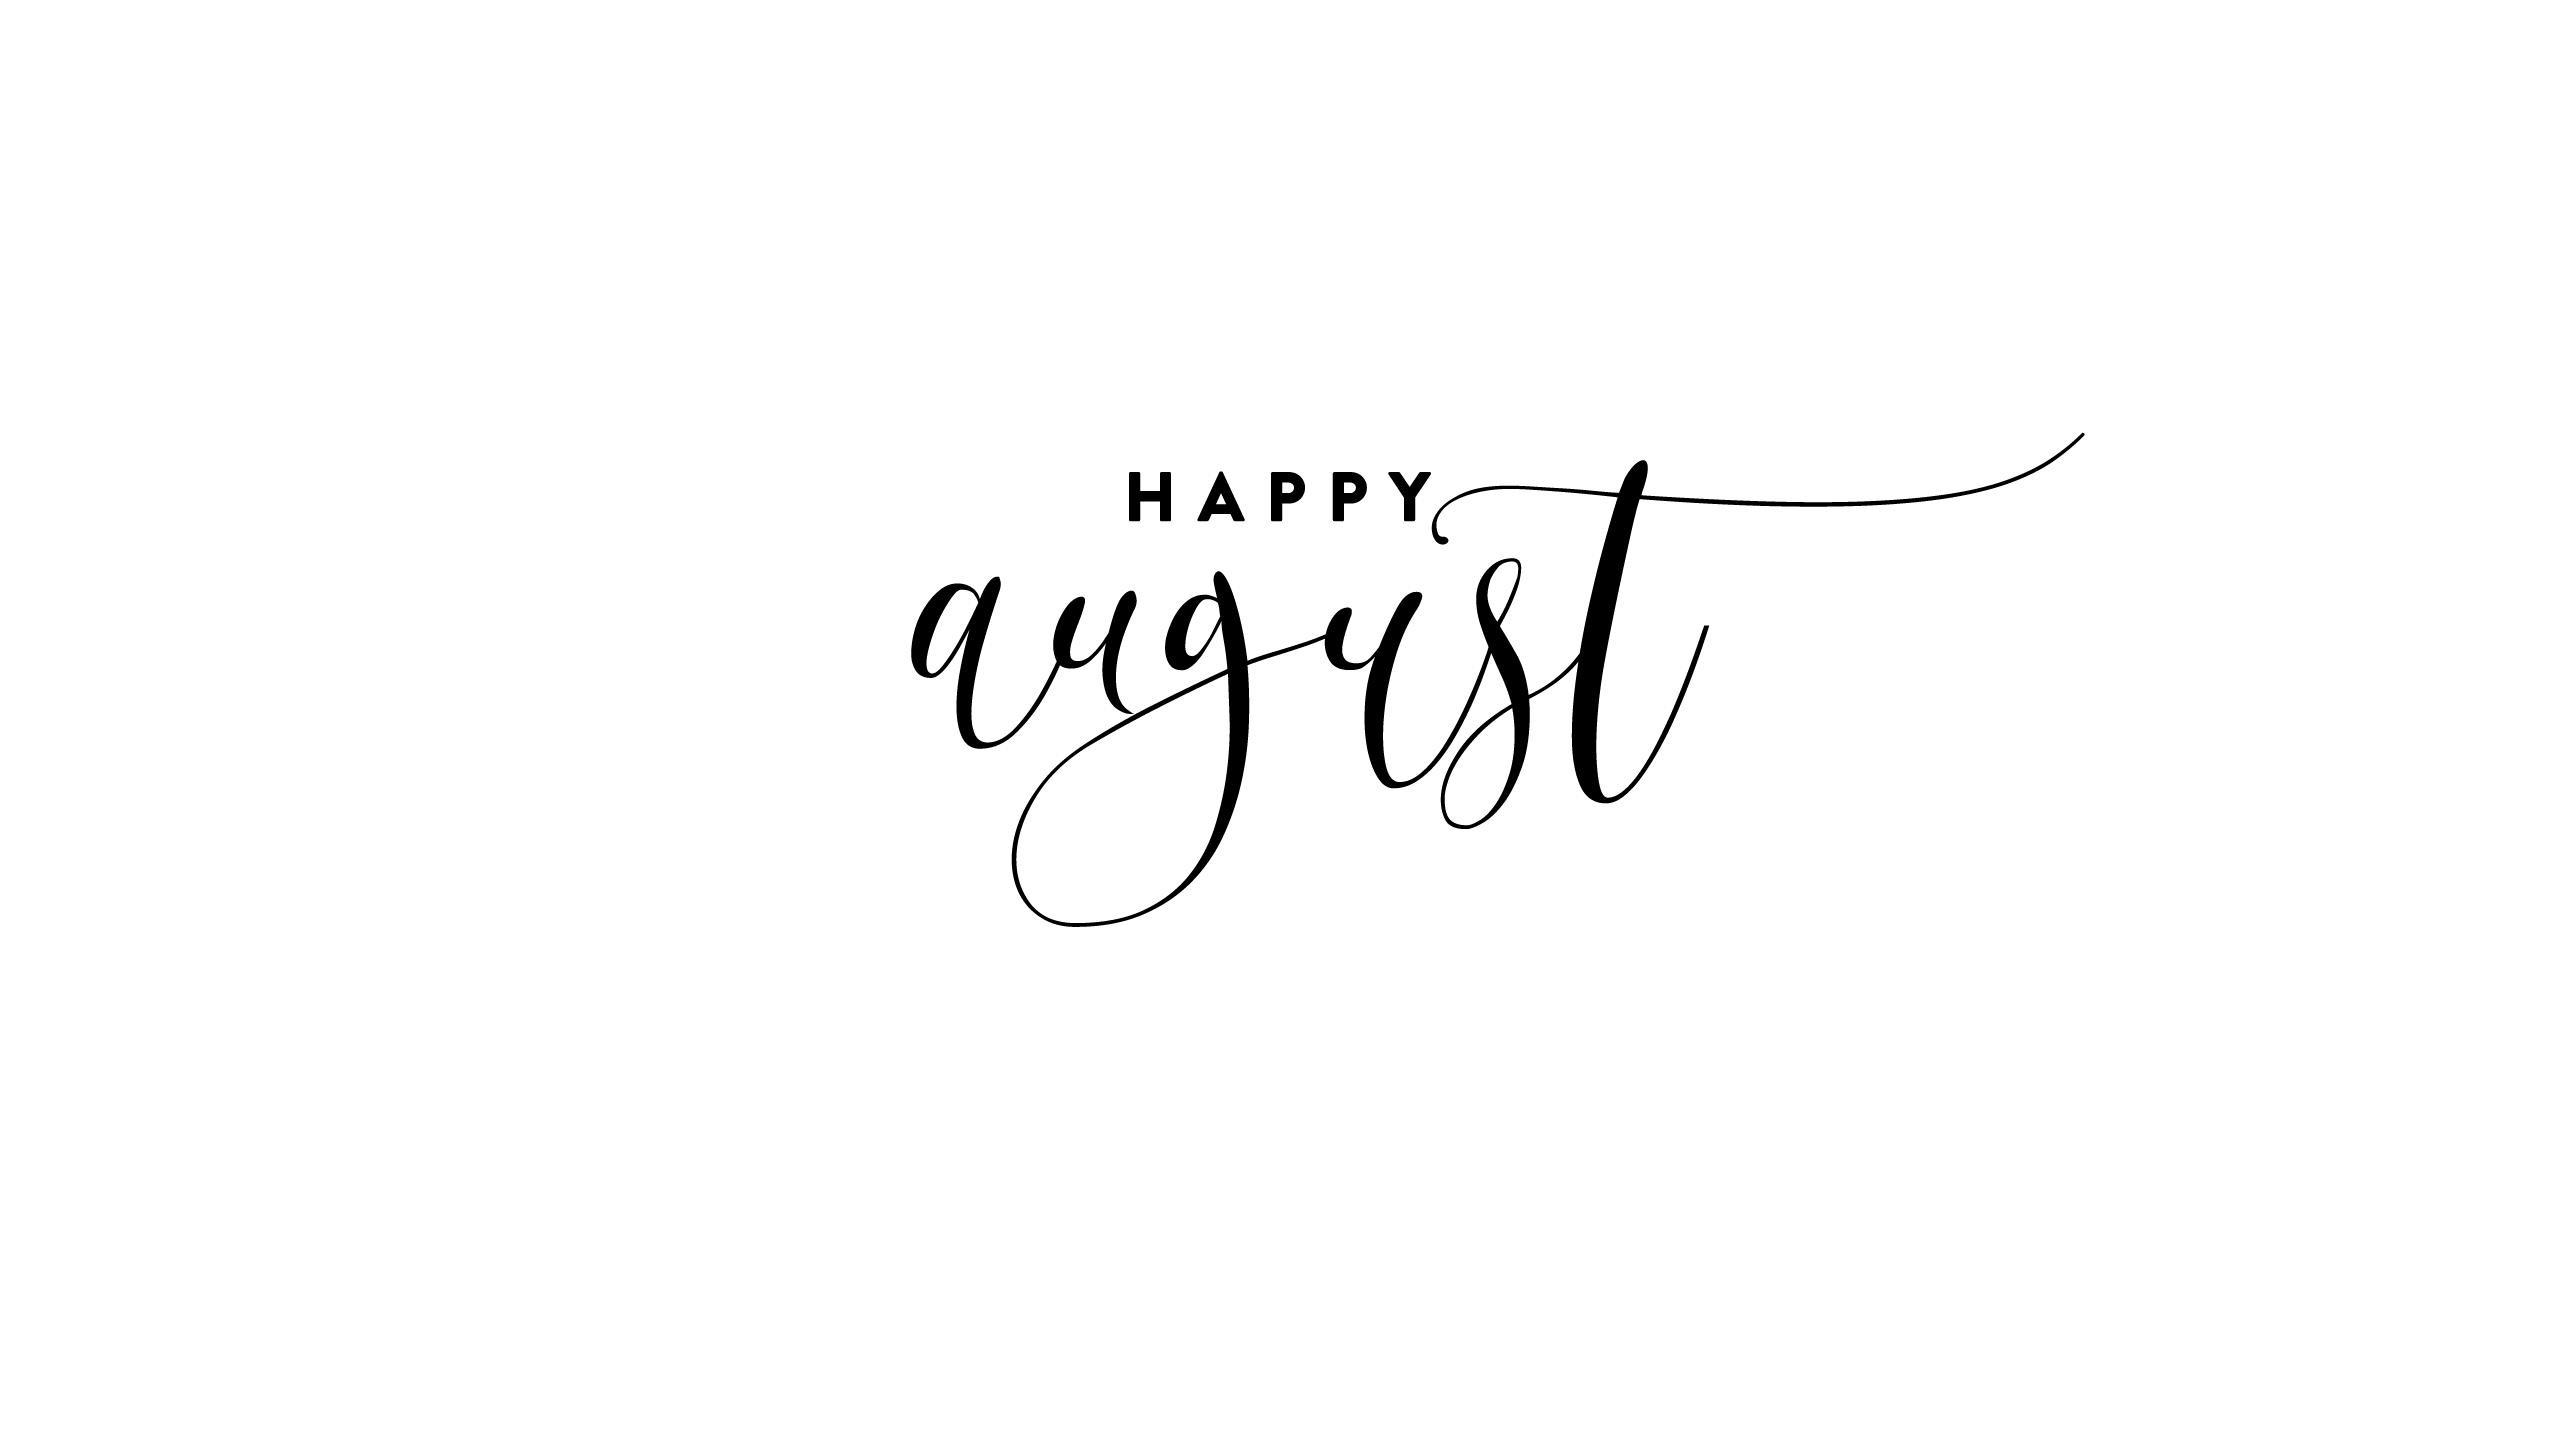 Calendar · Happy August · Verse